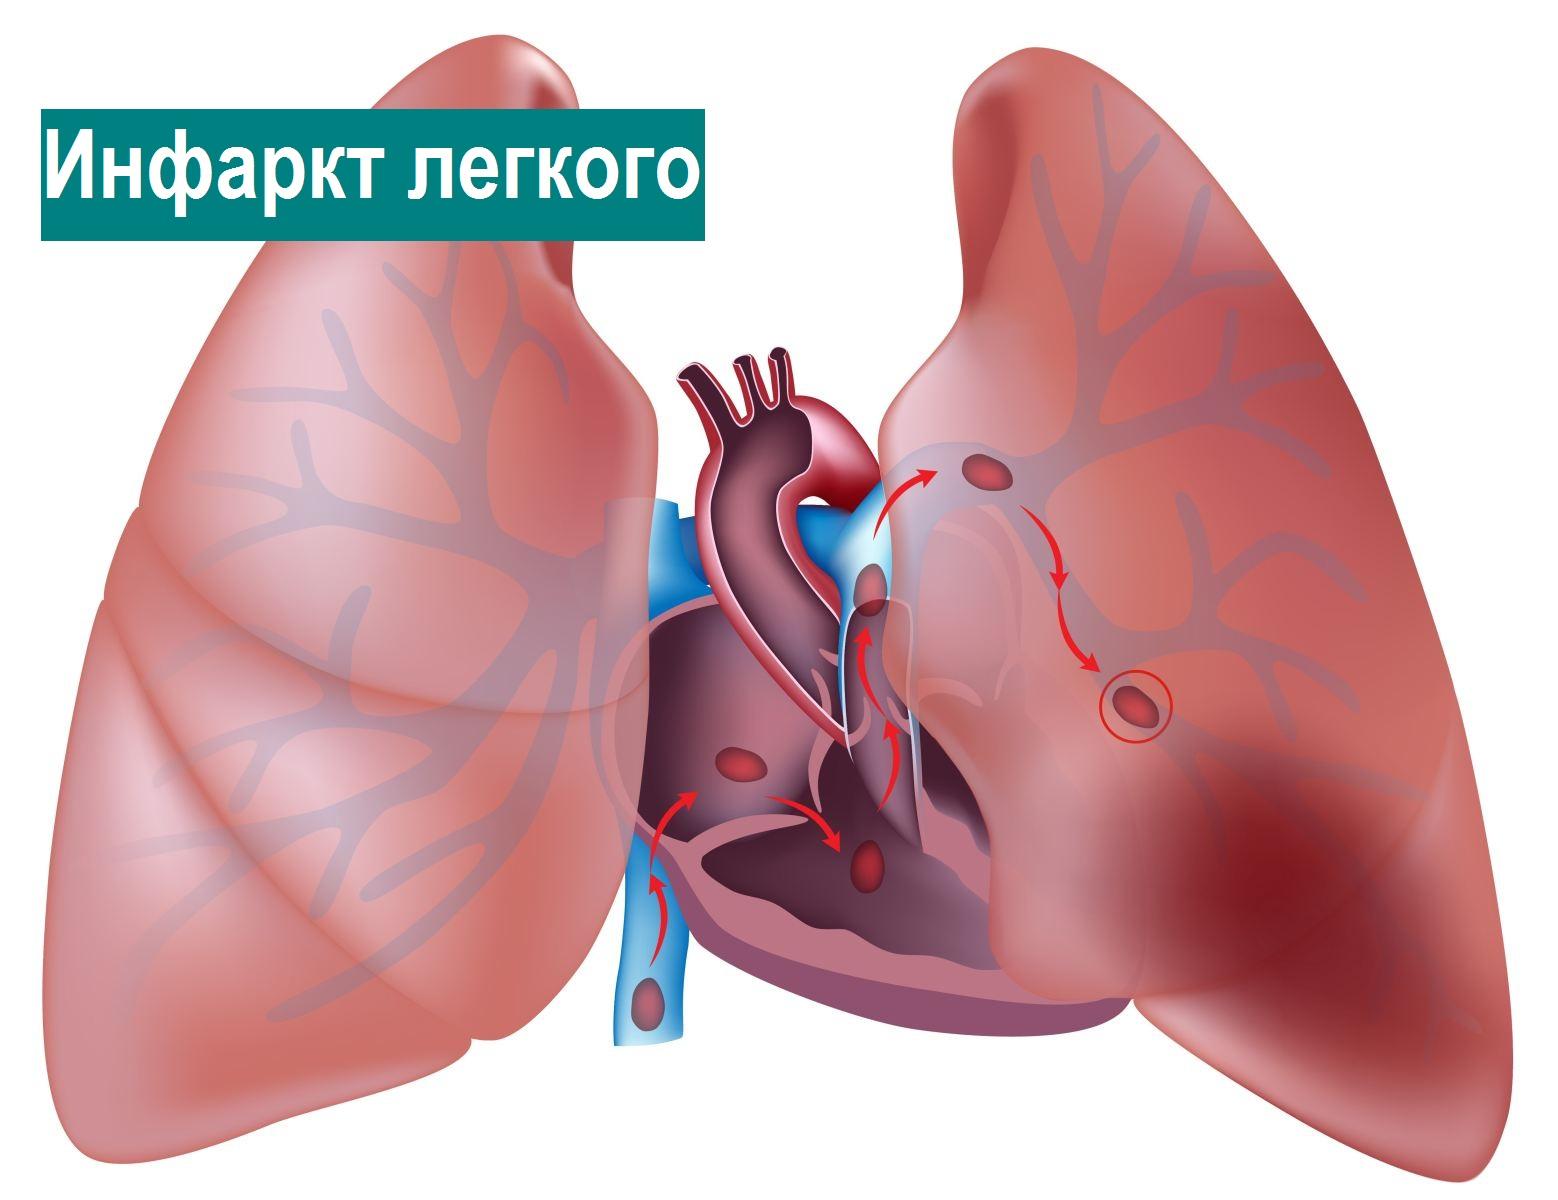 инфаркт легкого